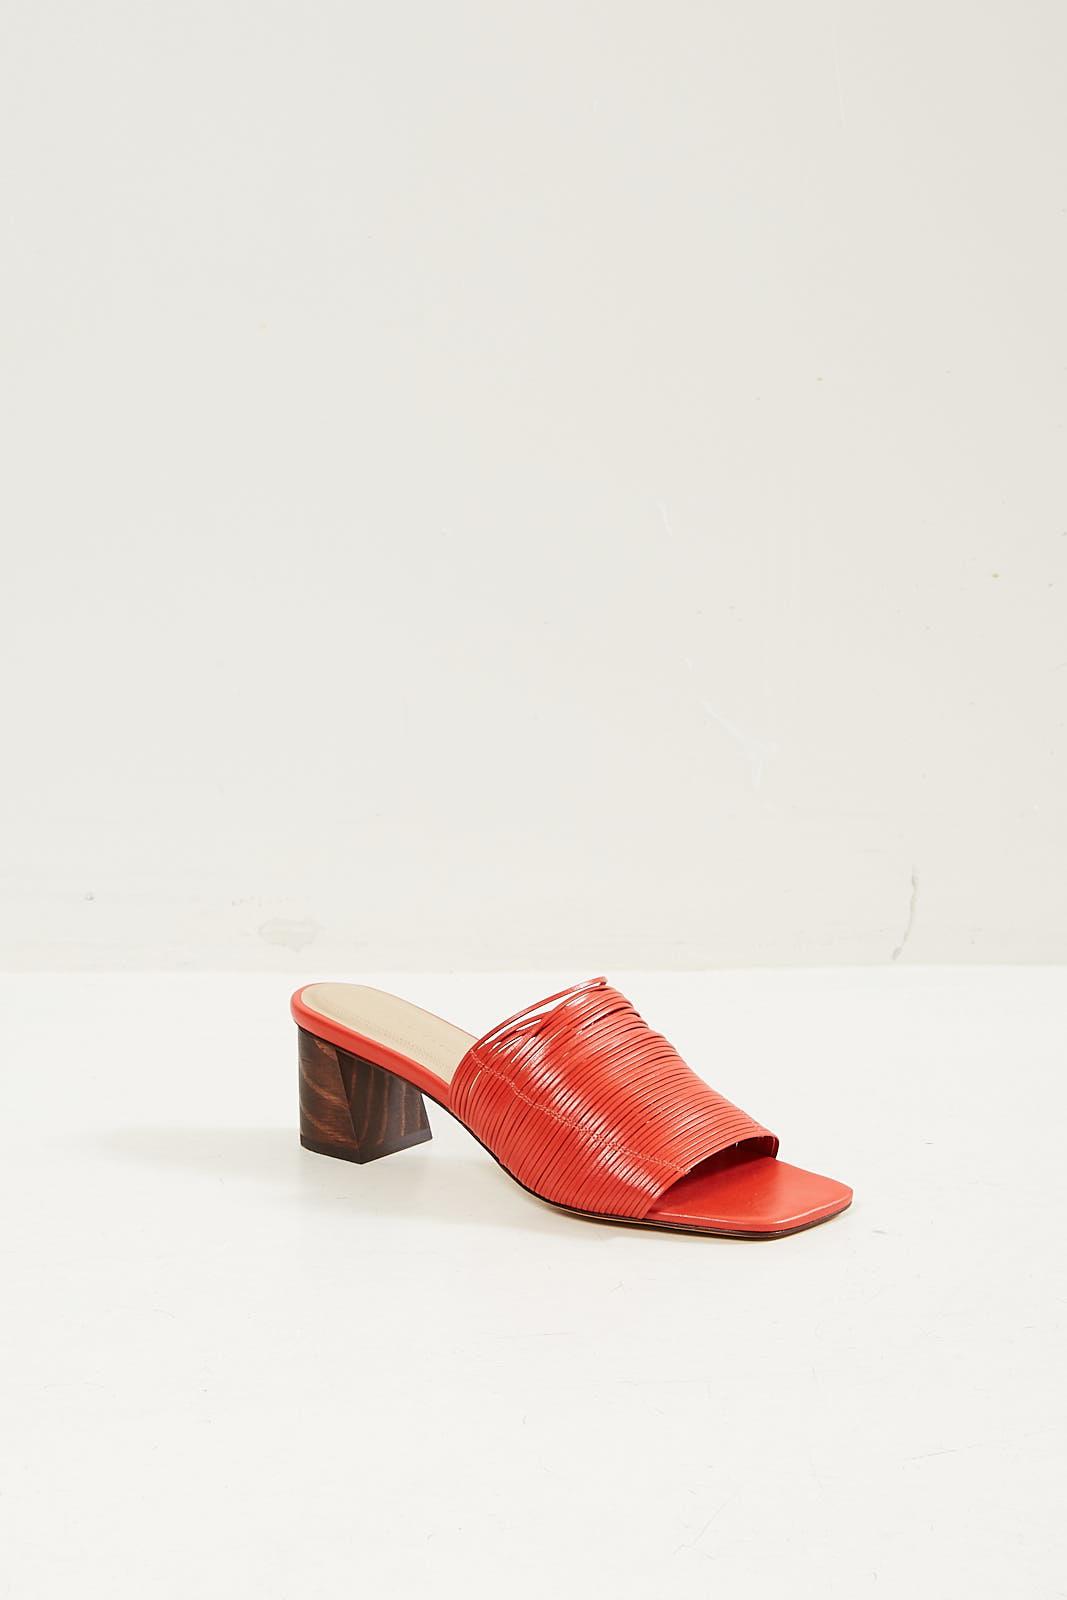 Mari Giudicelli Gisele sandal tanger